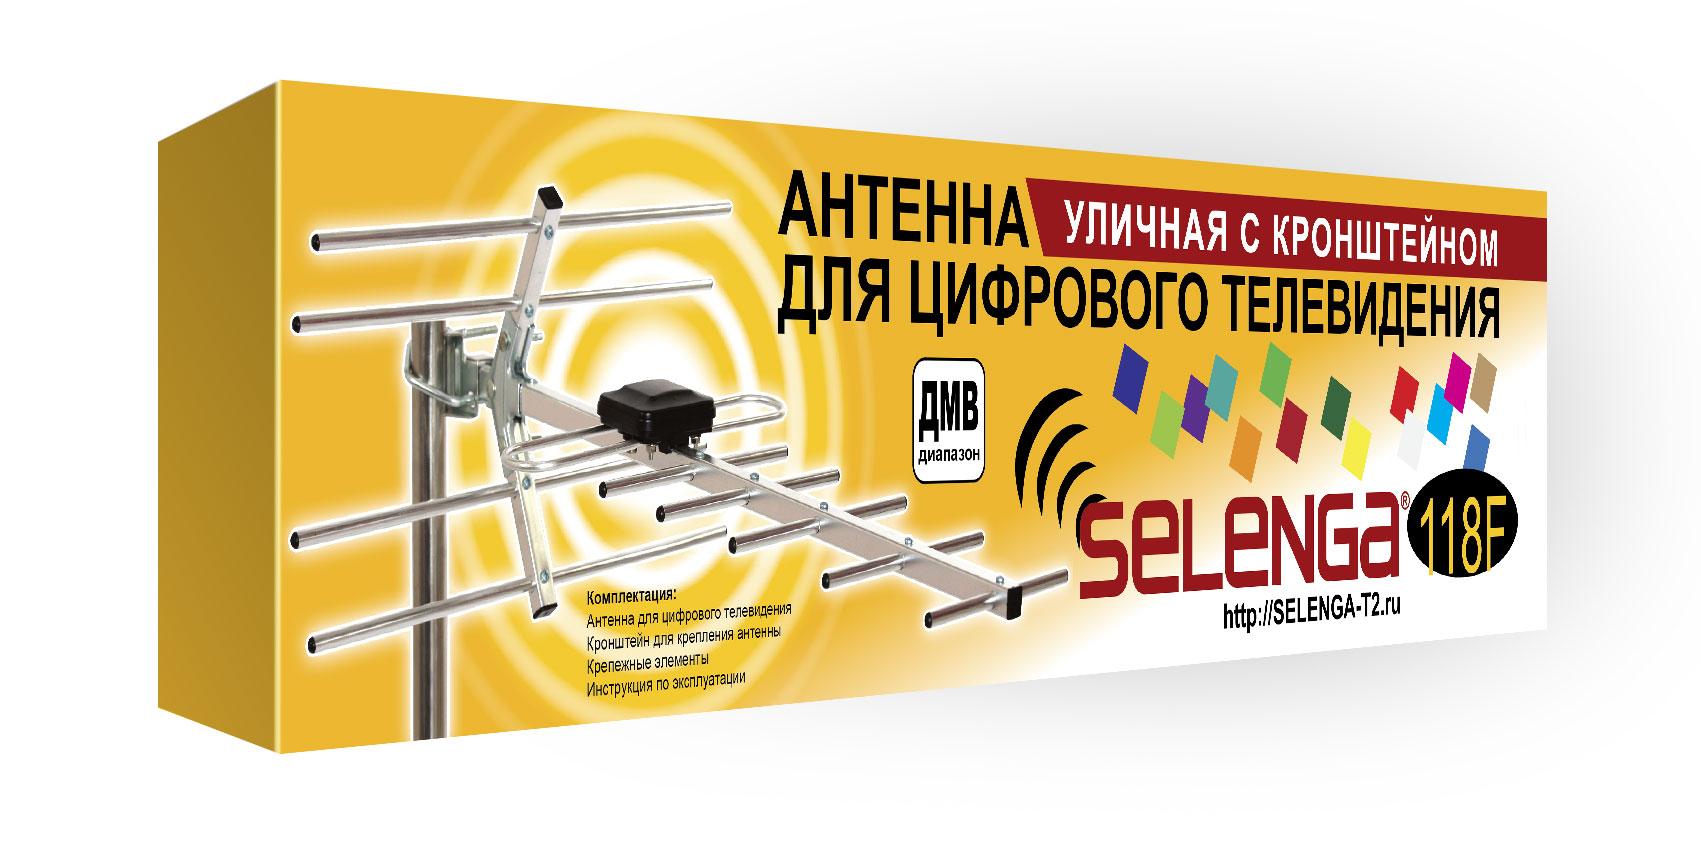 Уличная телевизионная антенна